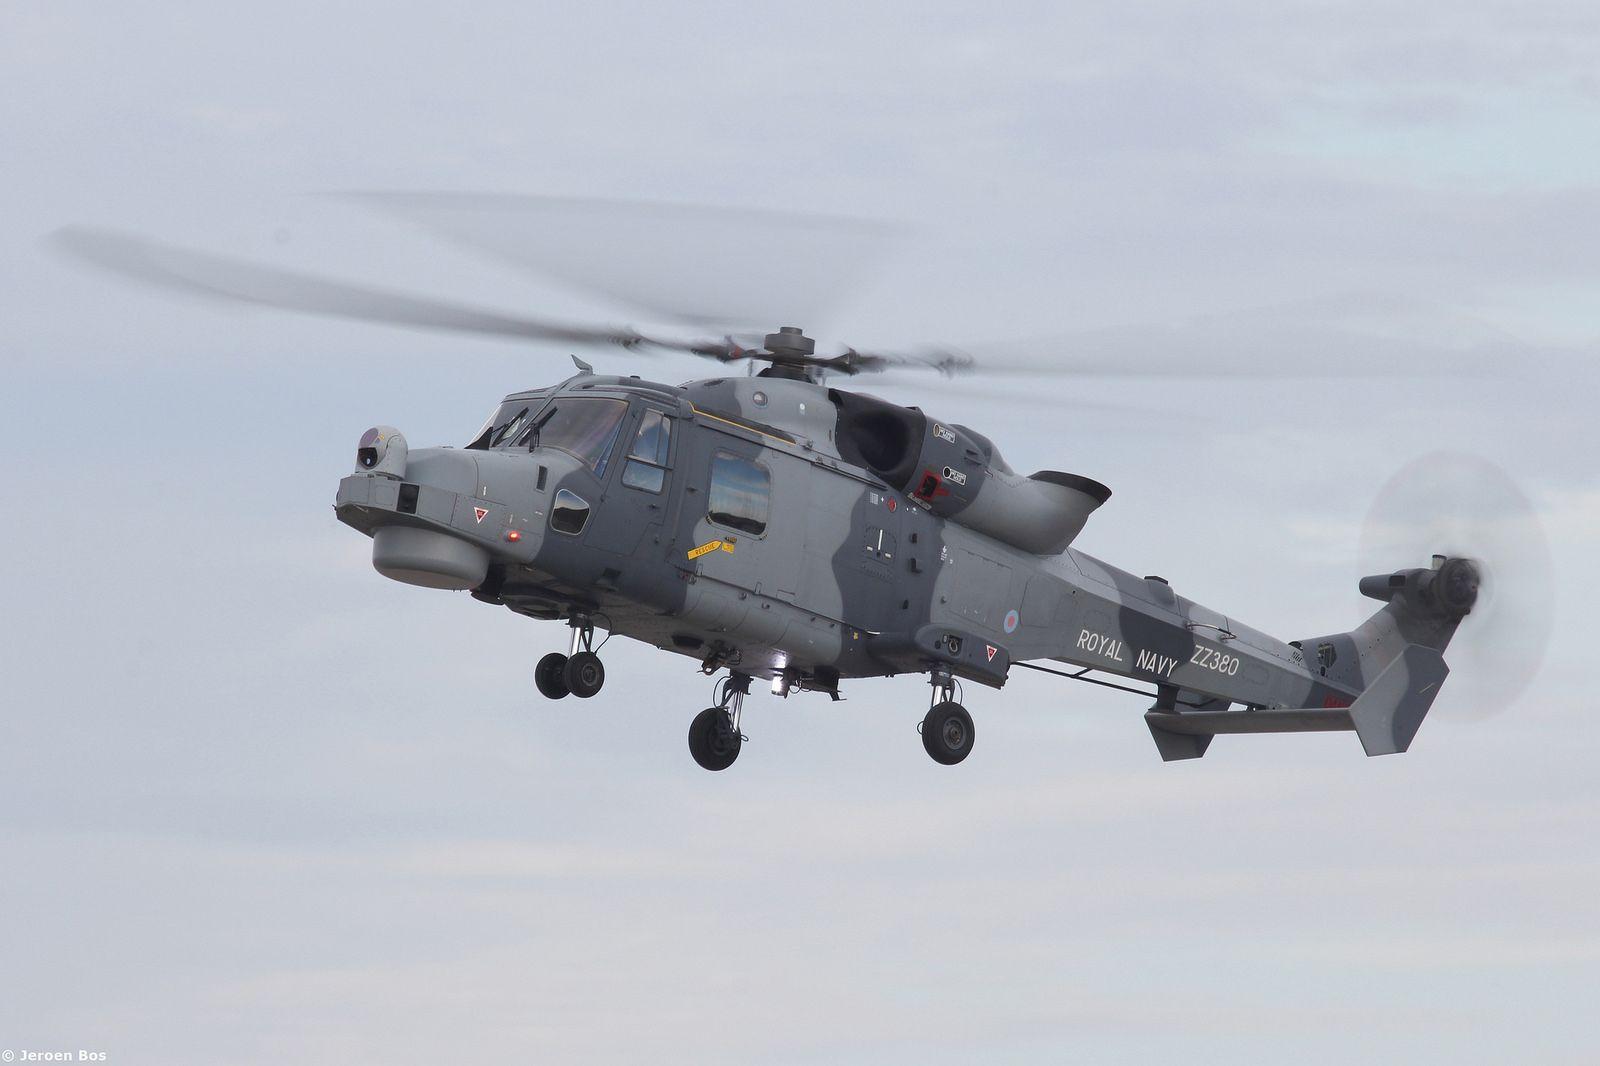 Wildcat hma royal navy zz during the malta international airshow